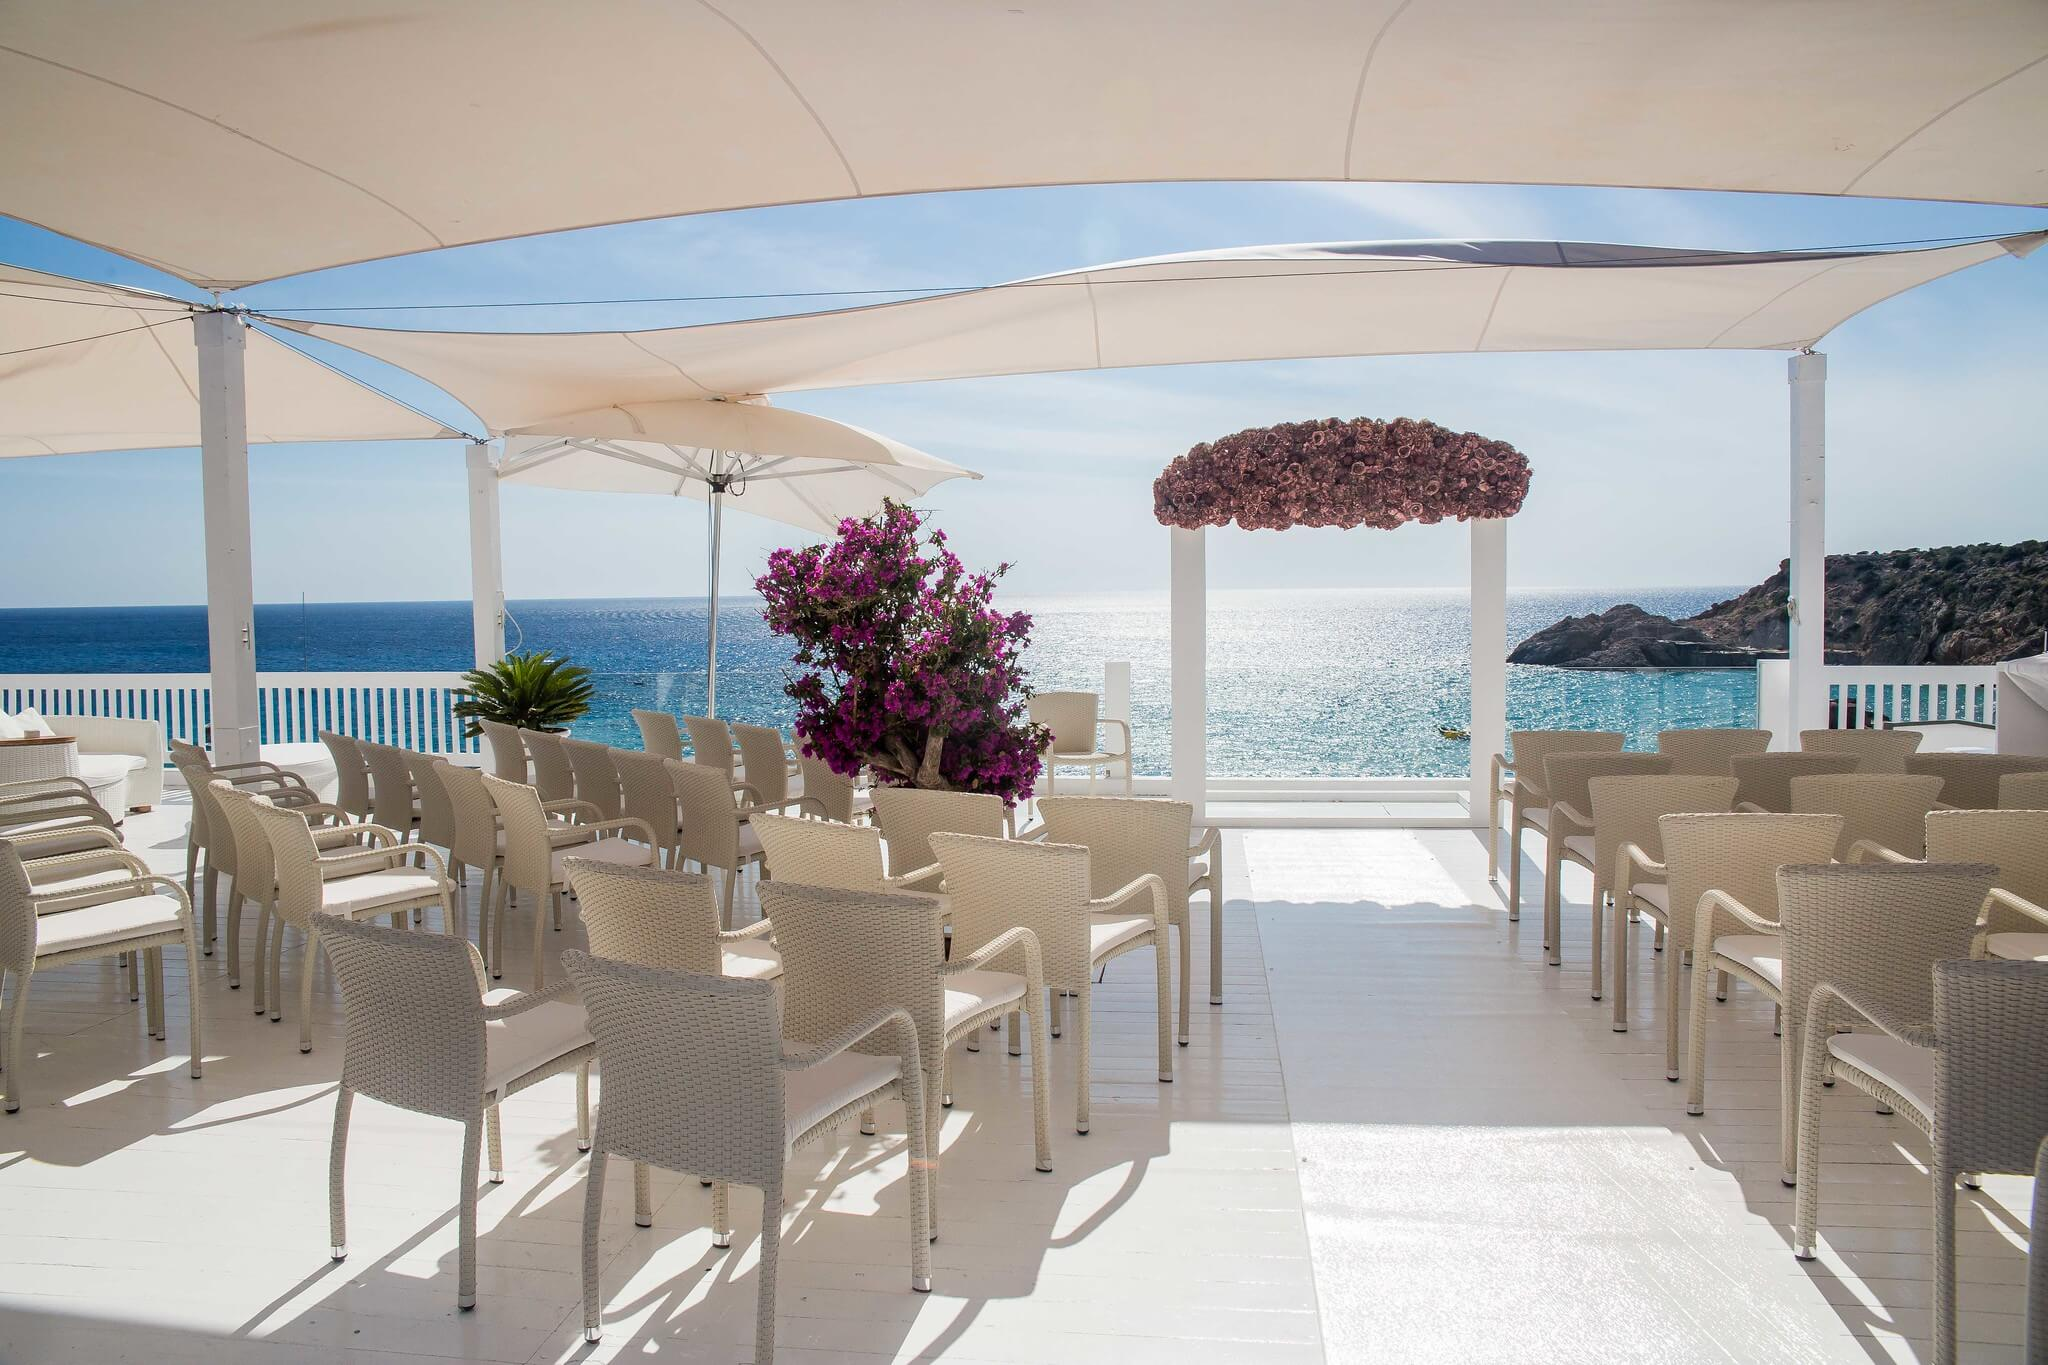 https://www.white-ibiza.com/wp-content/uploads/2020/03/ibiza-wedding-venues-cotton-beach-2020-02.jpg